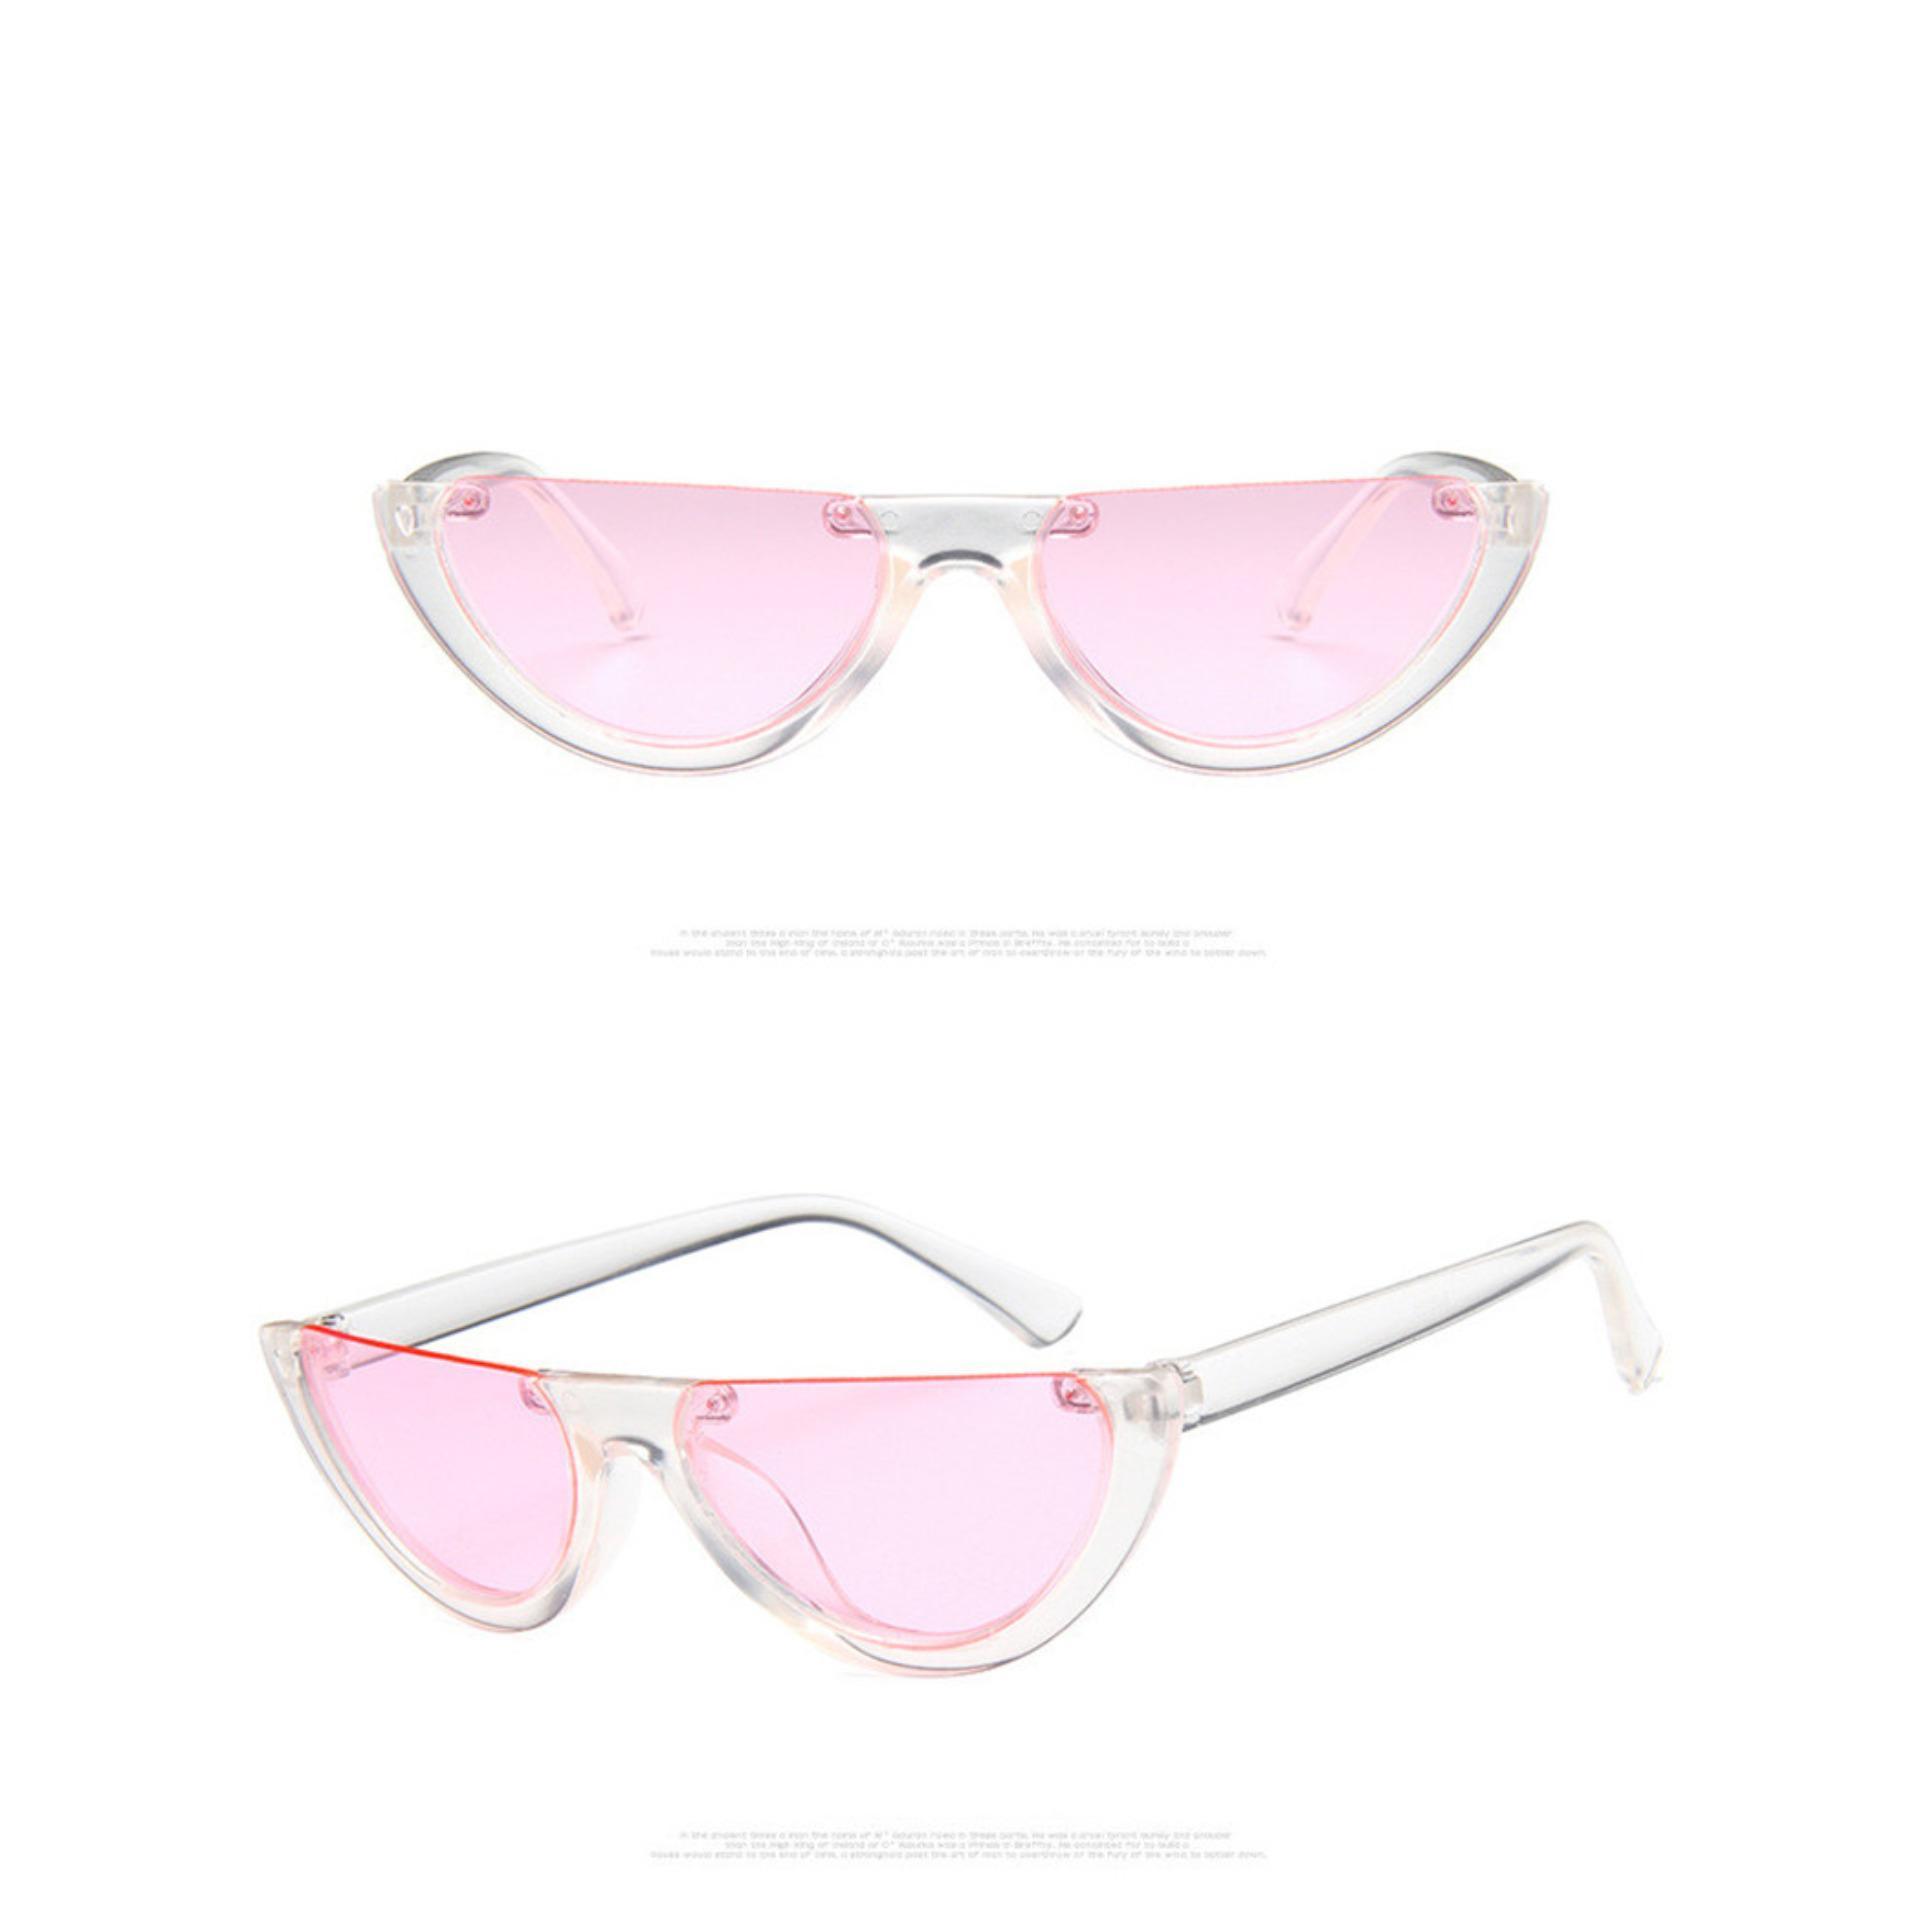 Fitur Timely Ladies Fashion Sunglasses 07889 Kacamata Fashion Wanita ... f558f96ee0